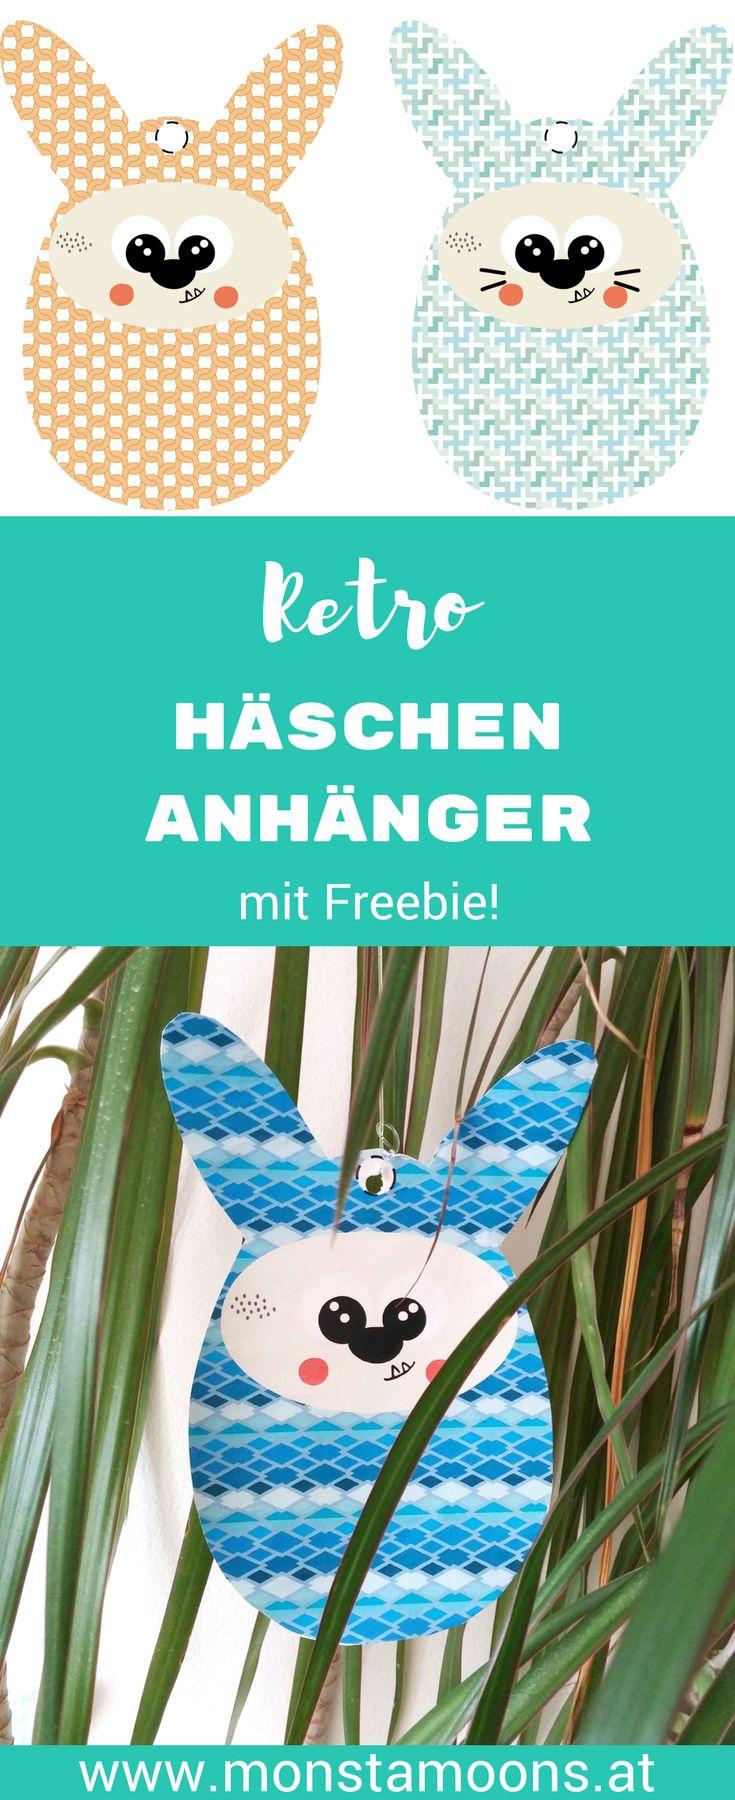 Hasendeko für Ostern, DIY Hasendeko, Hasen freebie, bunny printable, easter crafts, Monstamoons, easter pendant, Hasenanhänger